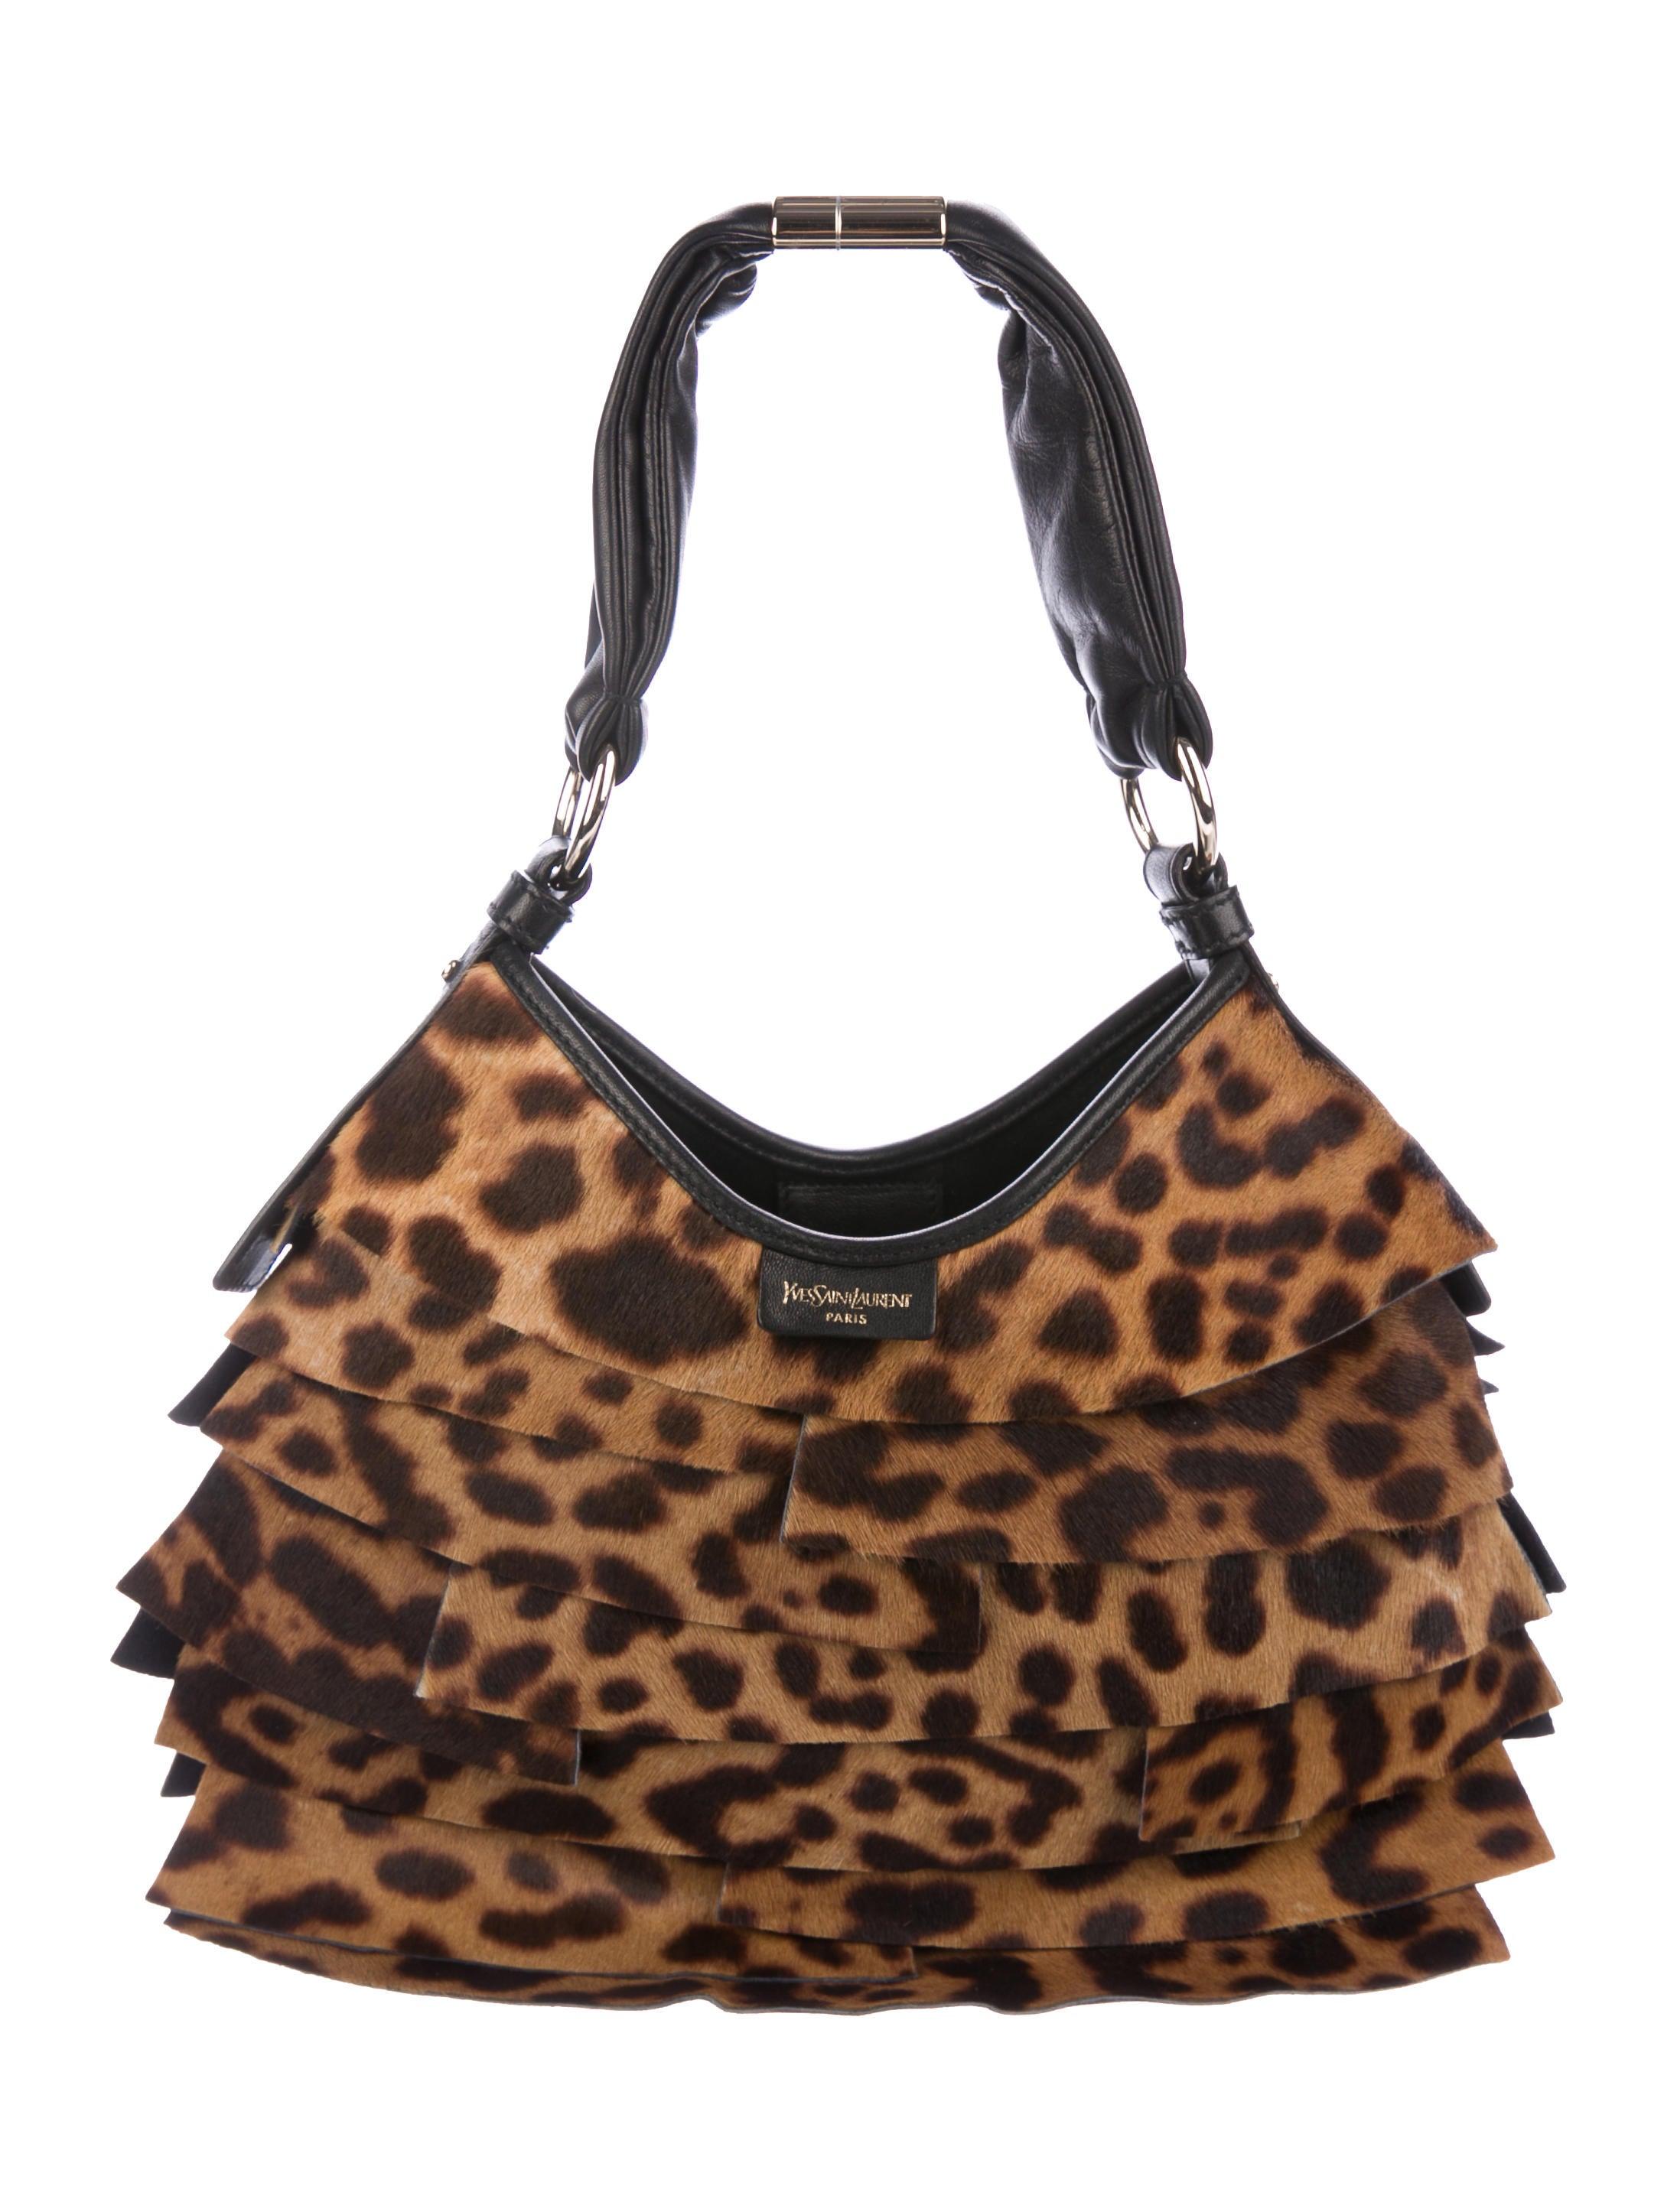 ff12bfa4d206 Yves Saint Laurent Ponyhair St. Tropez Bag - Handbags - YVE75127 ...